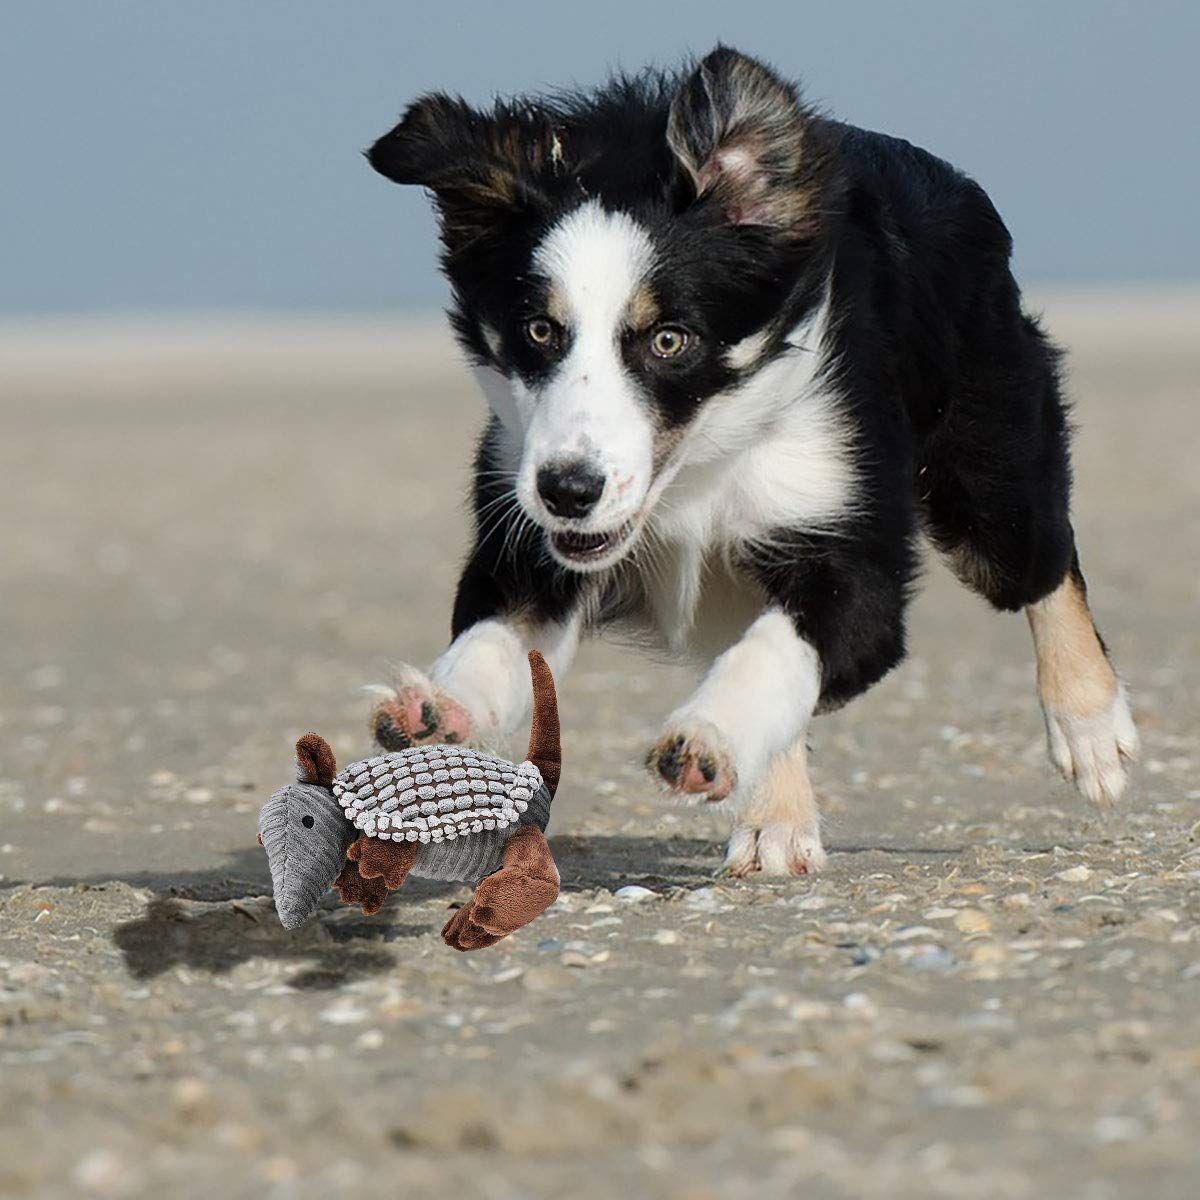 Legendog Dog Toys Puppy Toysinteractive Stuffed Dog Chew Toys Dog Squeaky Plush Toys Armadillo Puppy Chew Toys Puppies T Dog Chew Toys Puppy Chew Toys Dog Toys